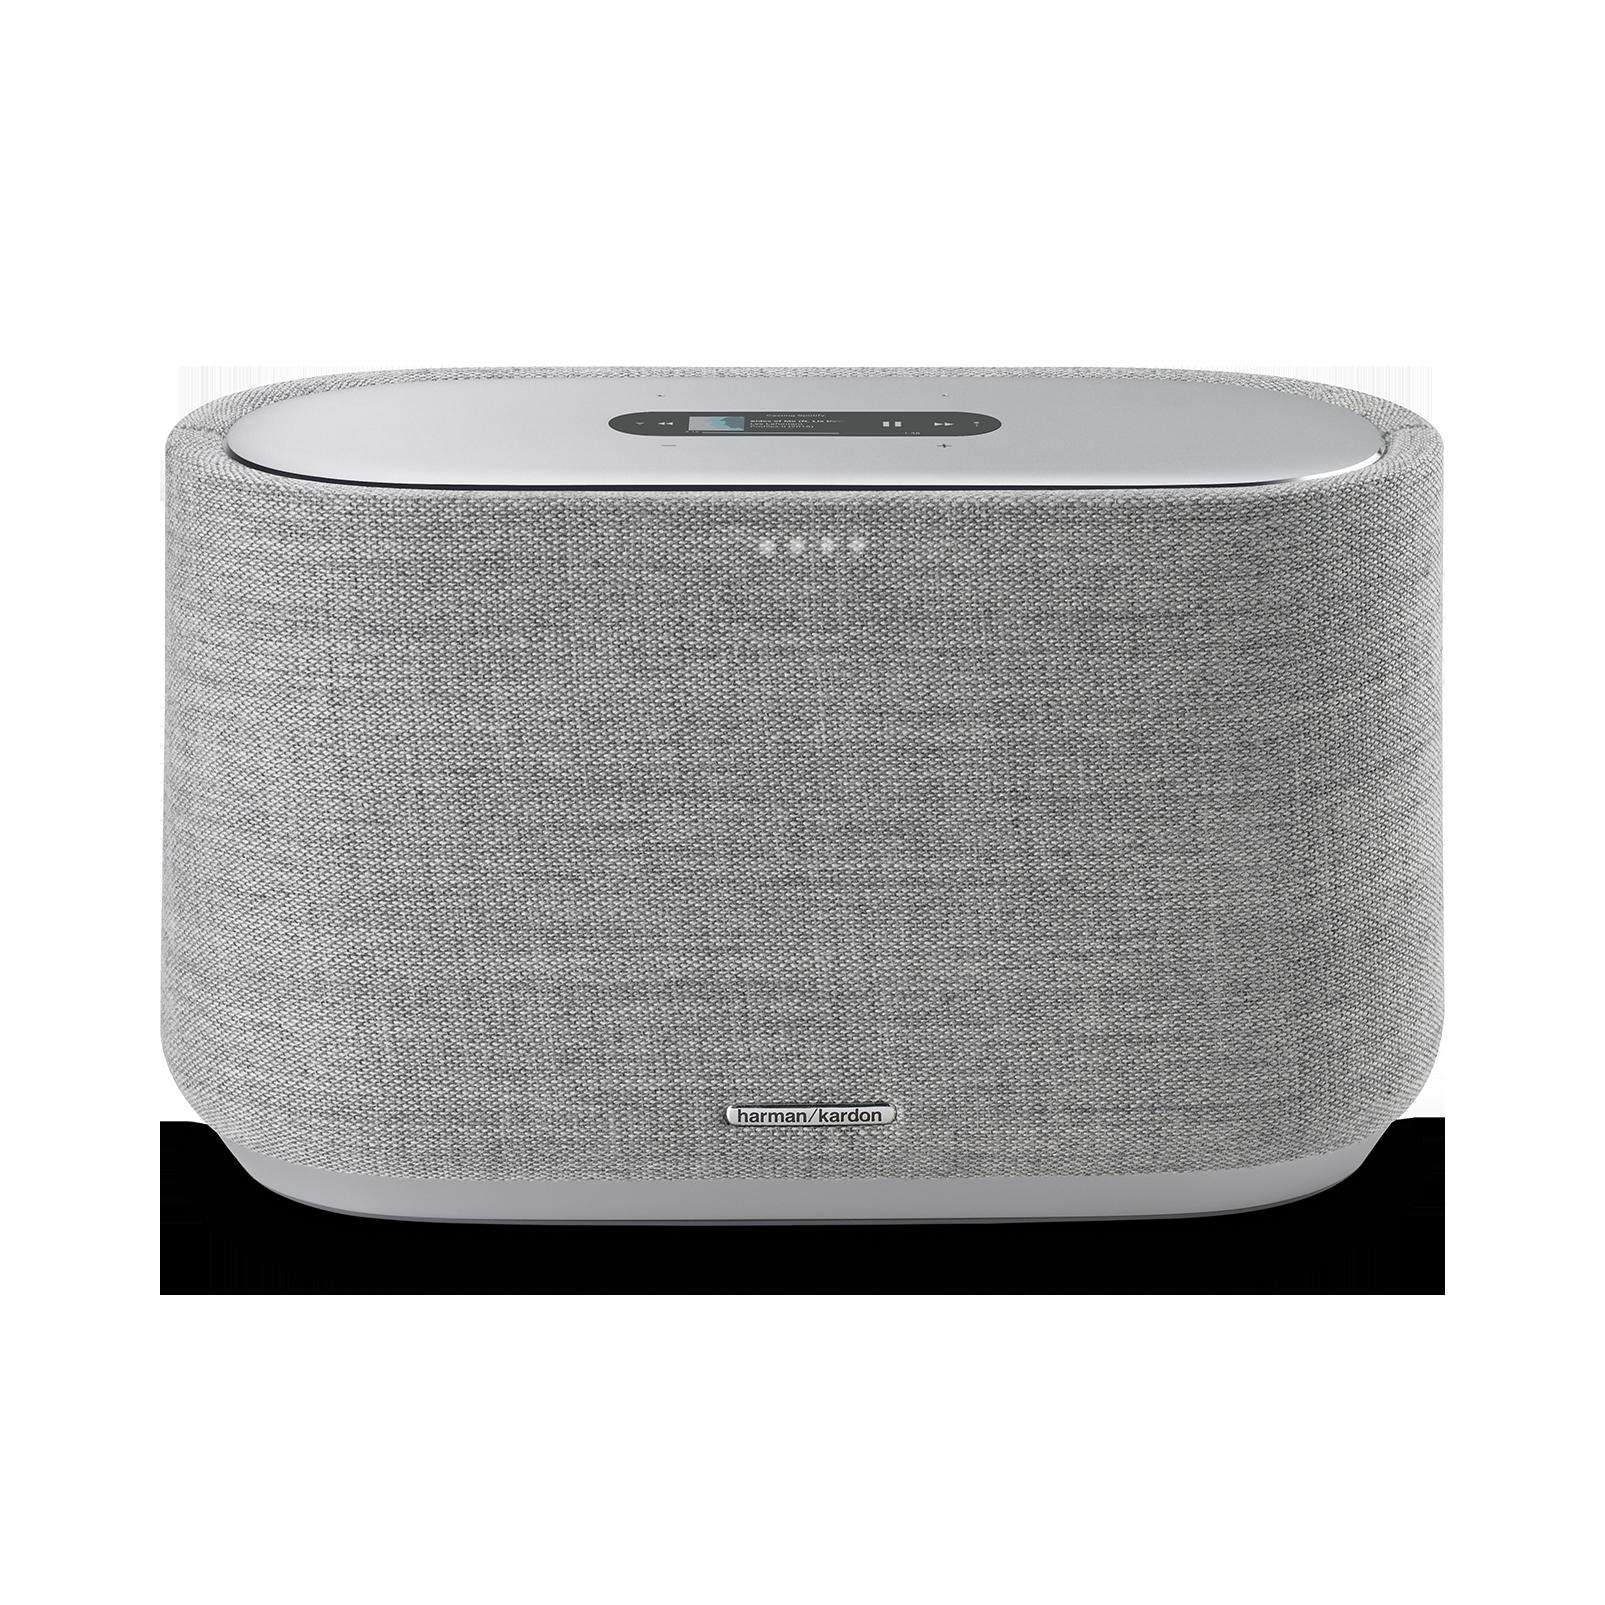 Harman Kardon Citation 300 - Grey - The medium-size smart home speaker with award winning design - Front